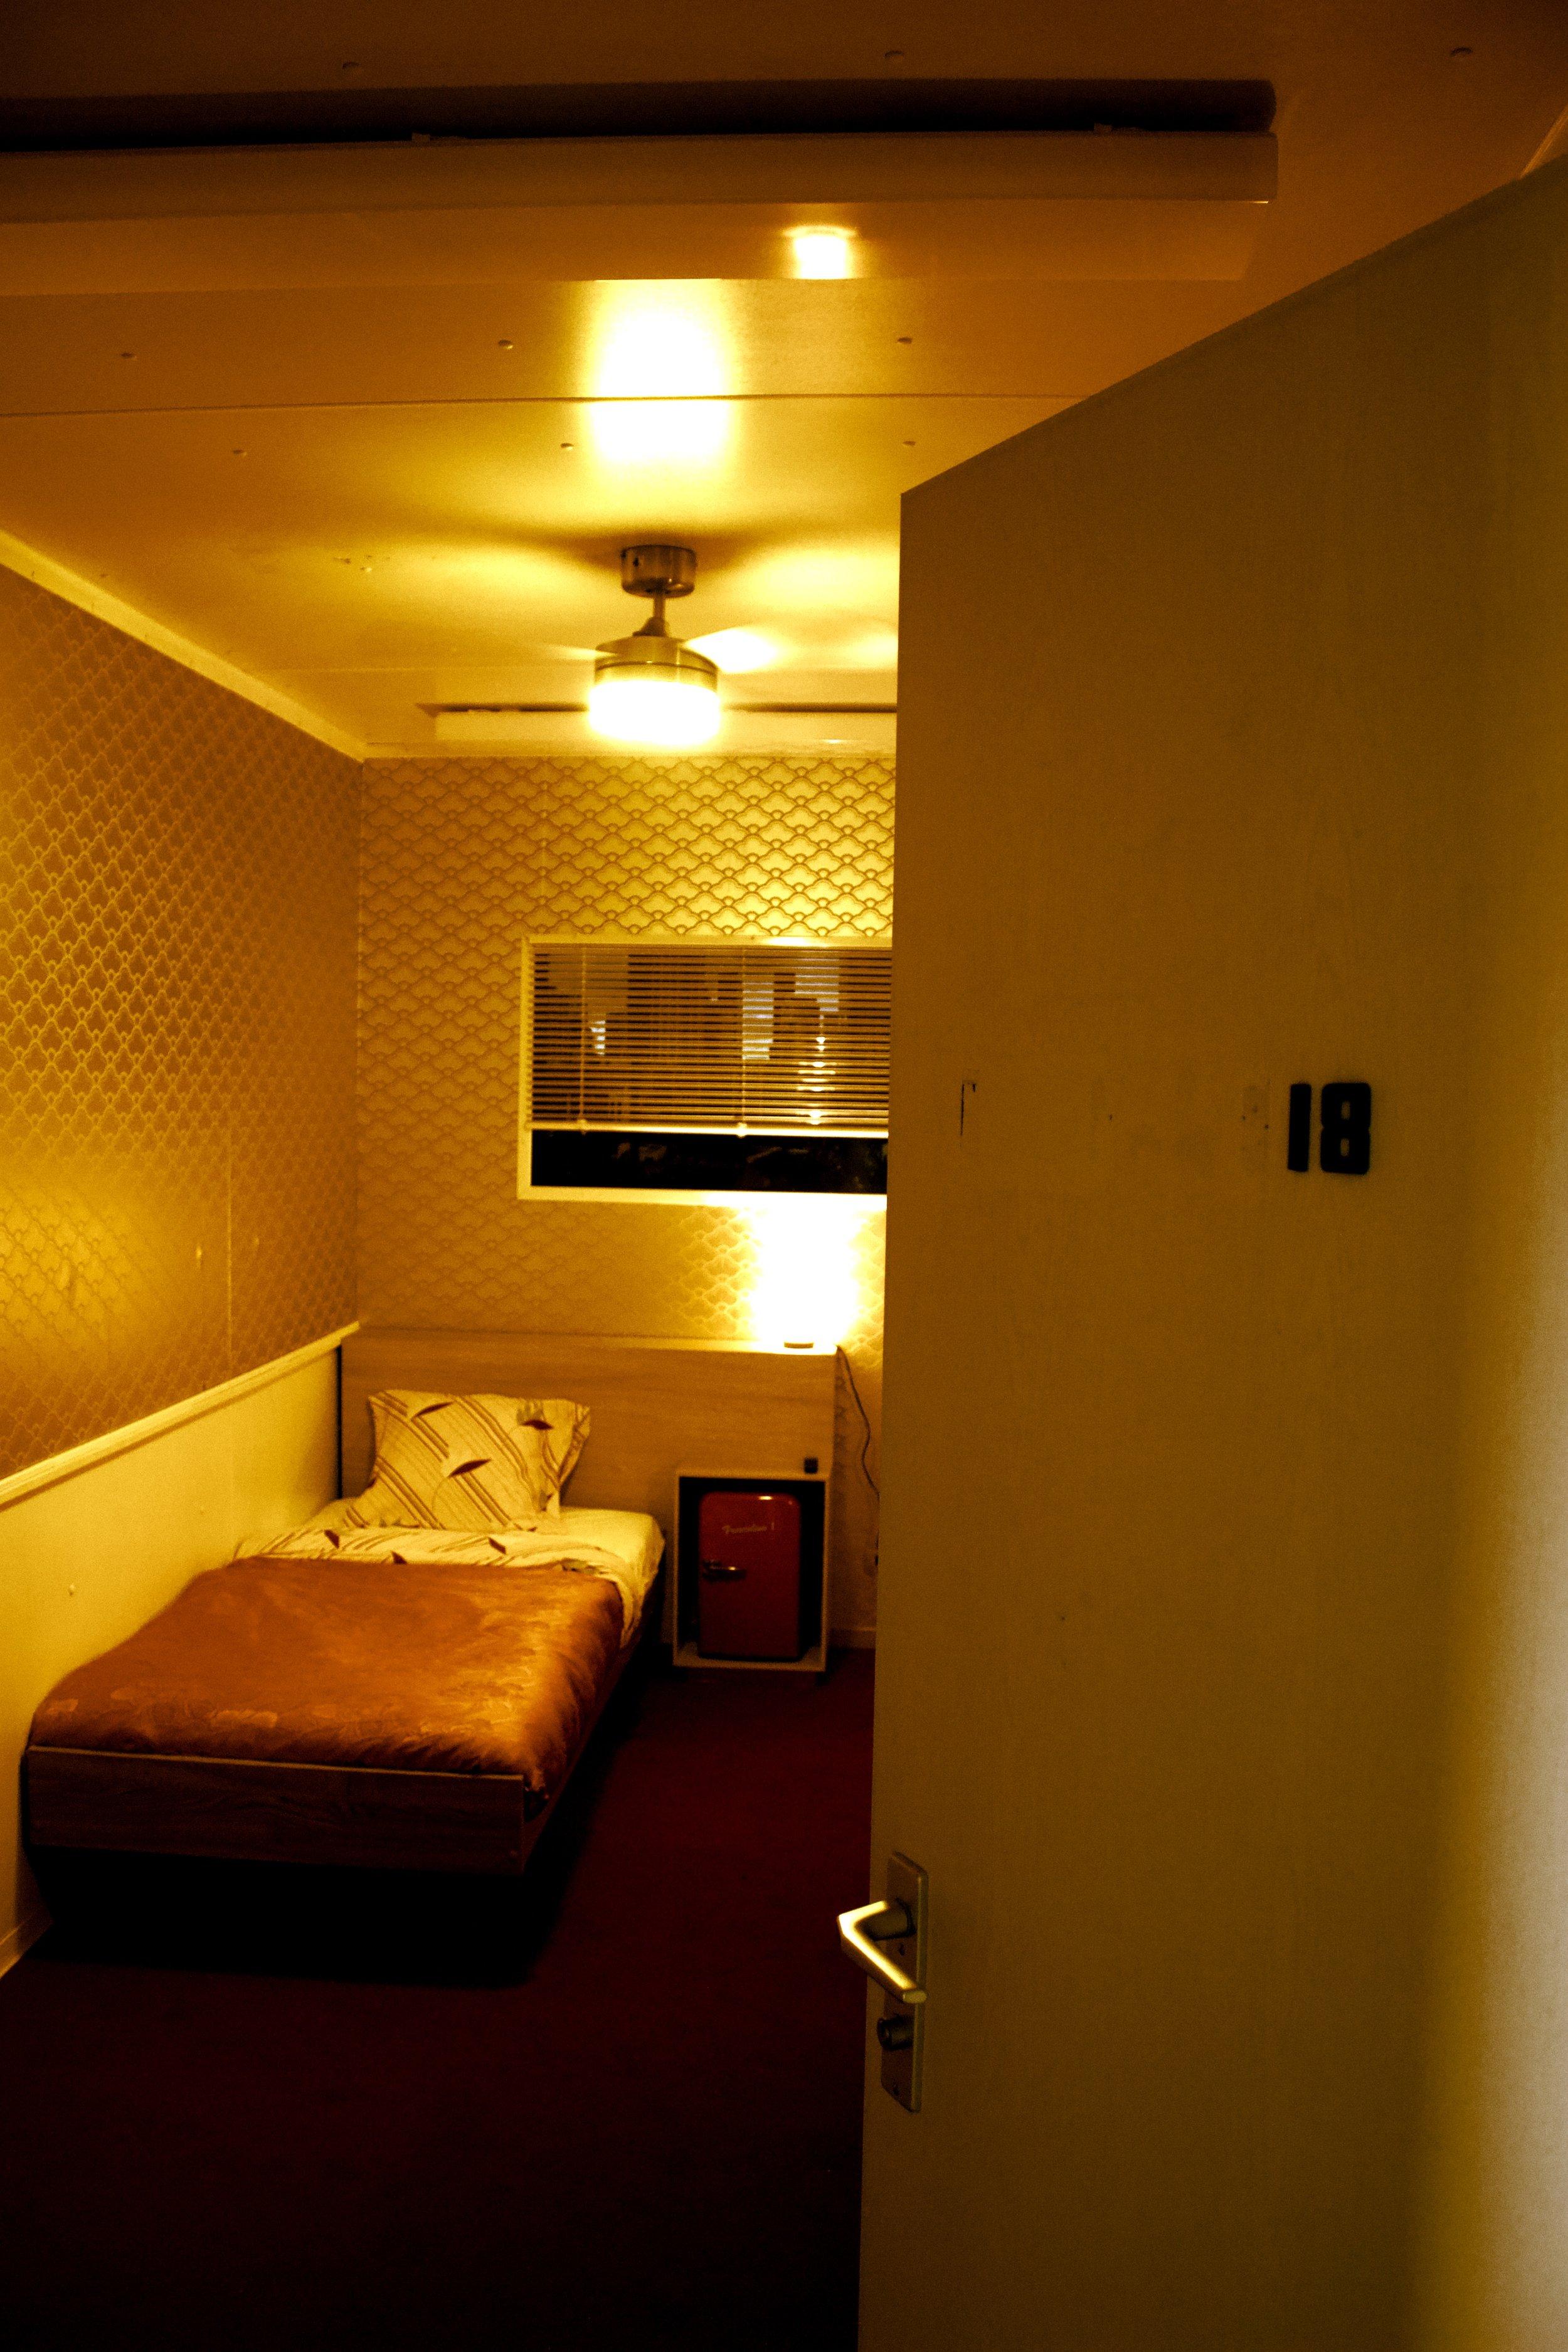 Zimmer18_1_Filter.jpg